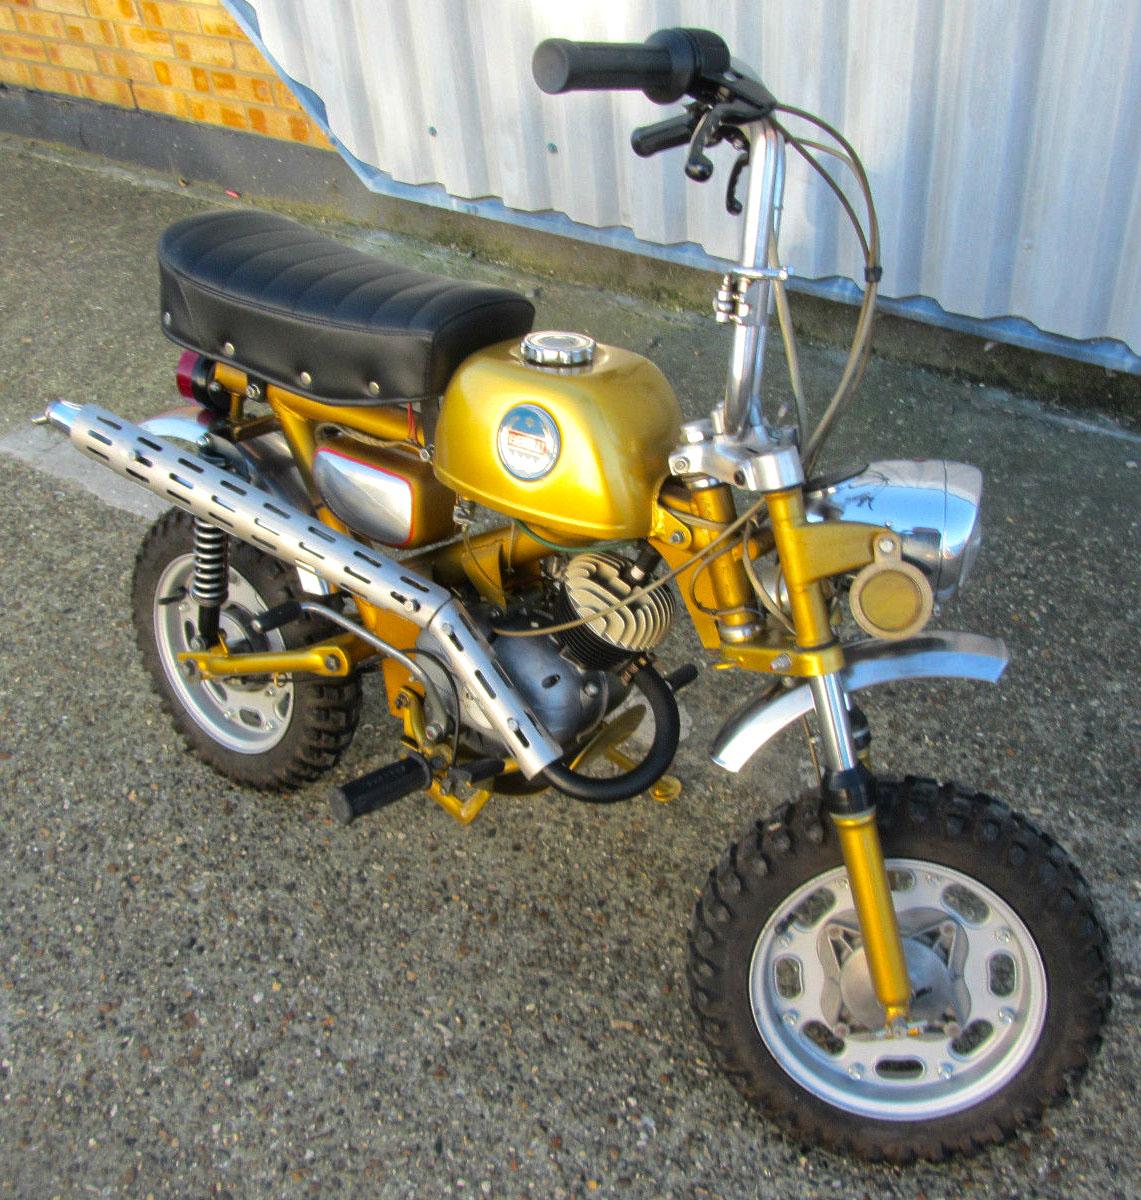 benelli_moped_ebay_hero